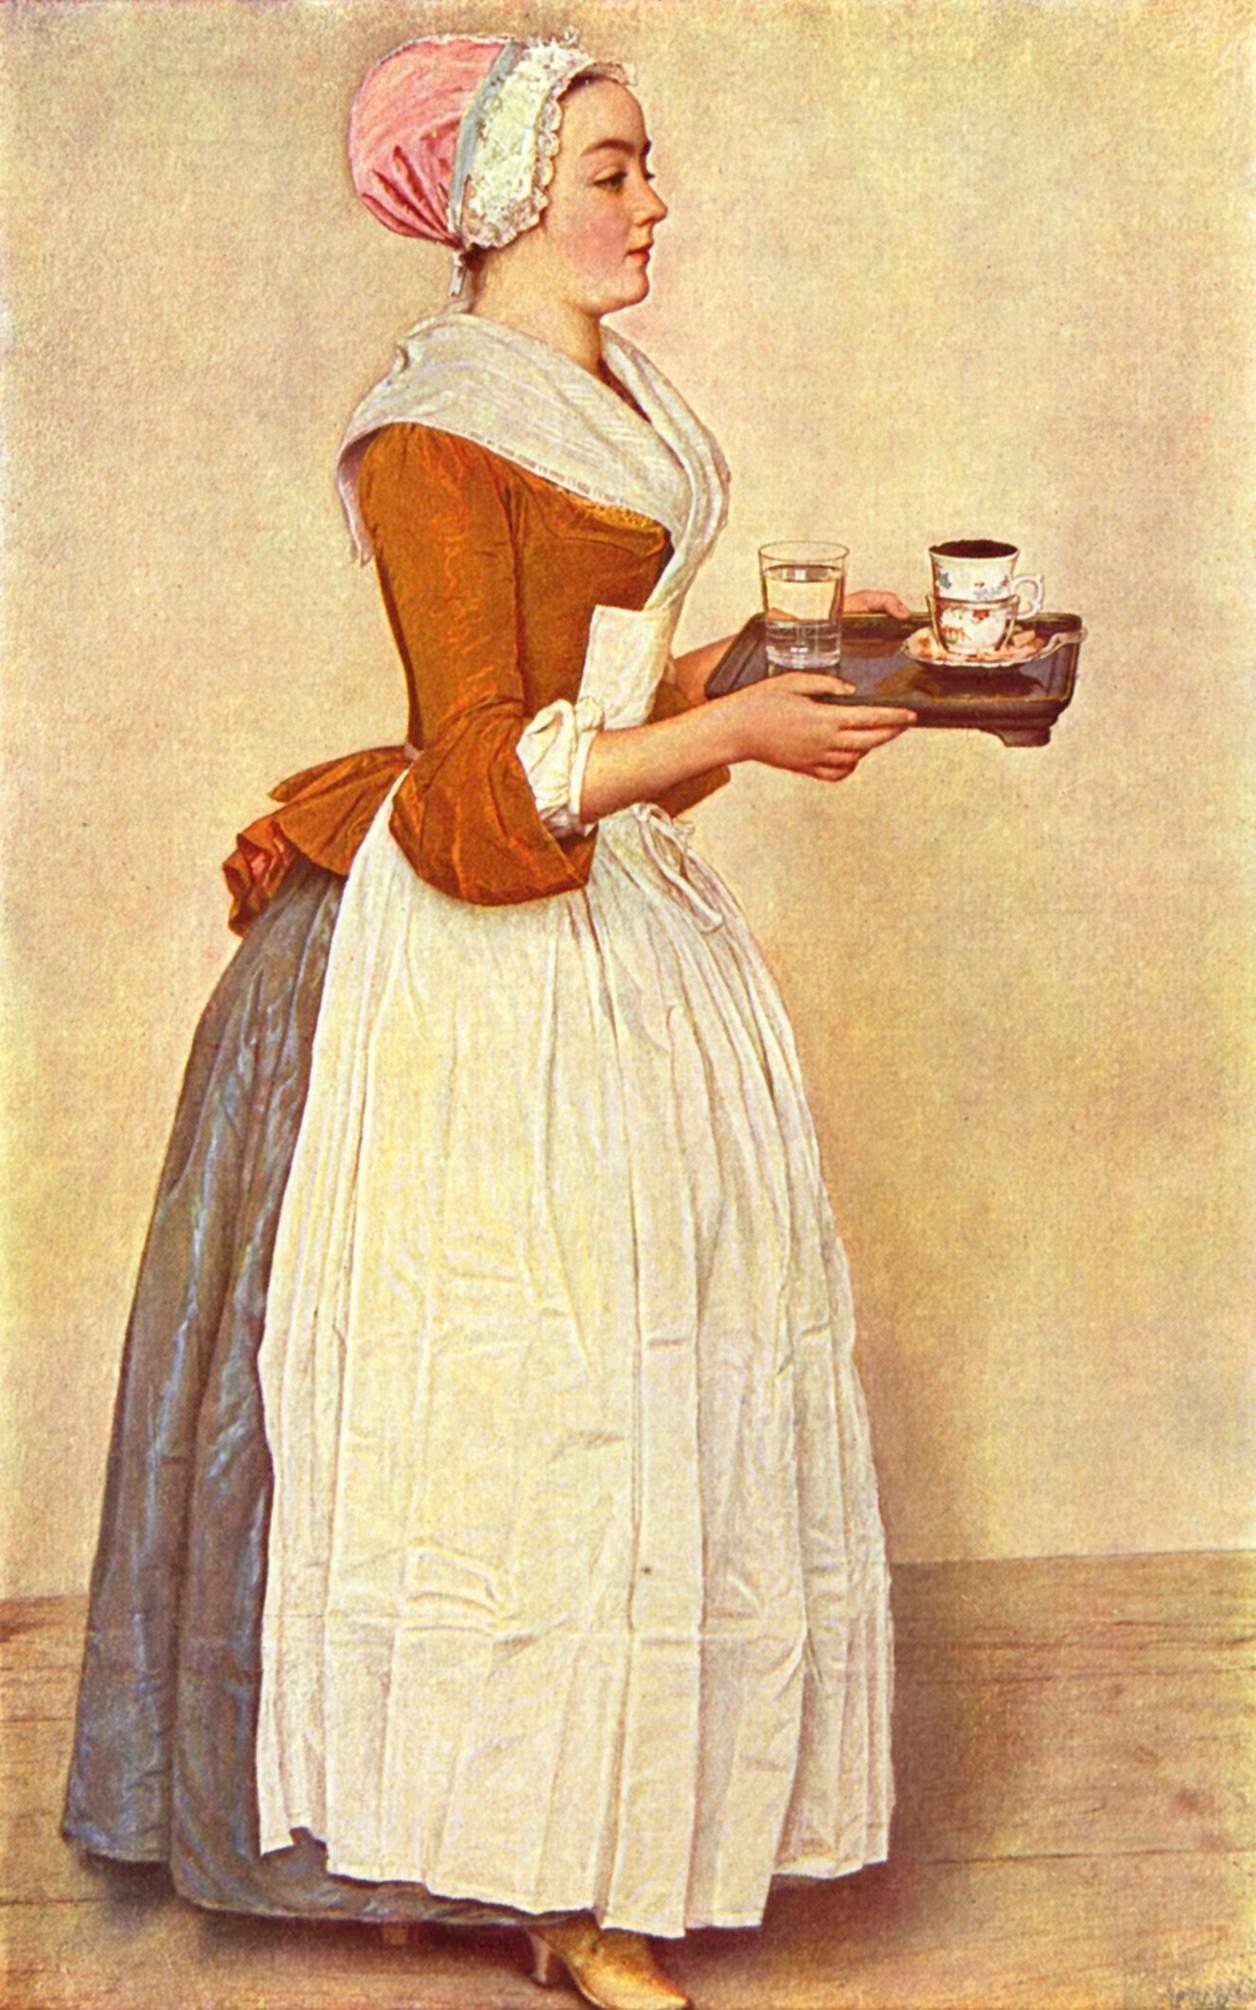 kitchen maid elegant curtains 女佣 维基百科 自由的百科全书 厨房女仆